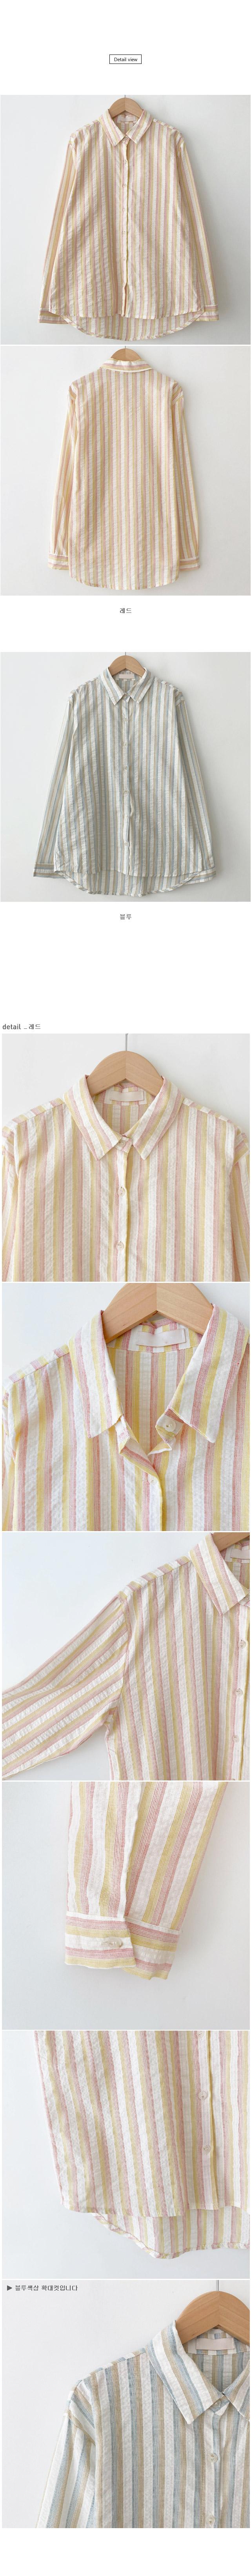 Luffy striped cotton shirt